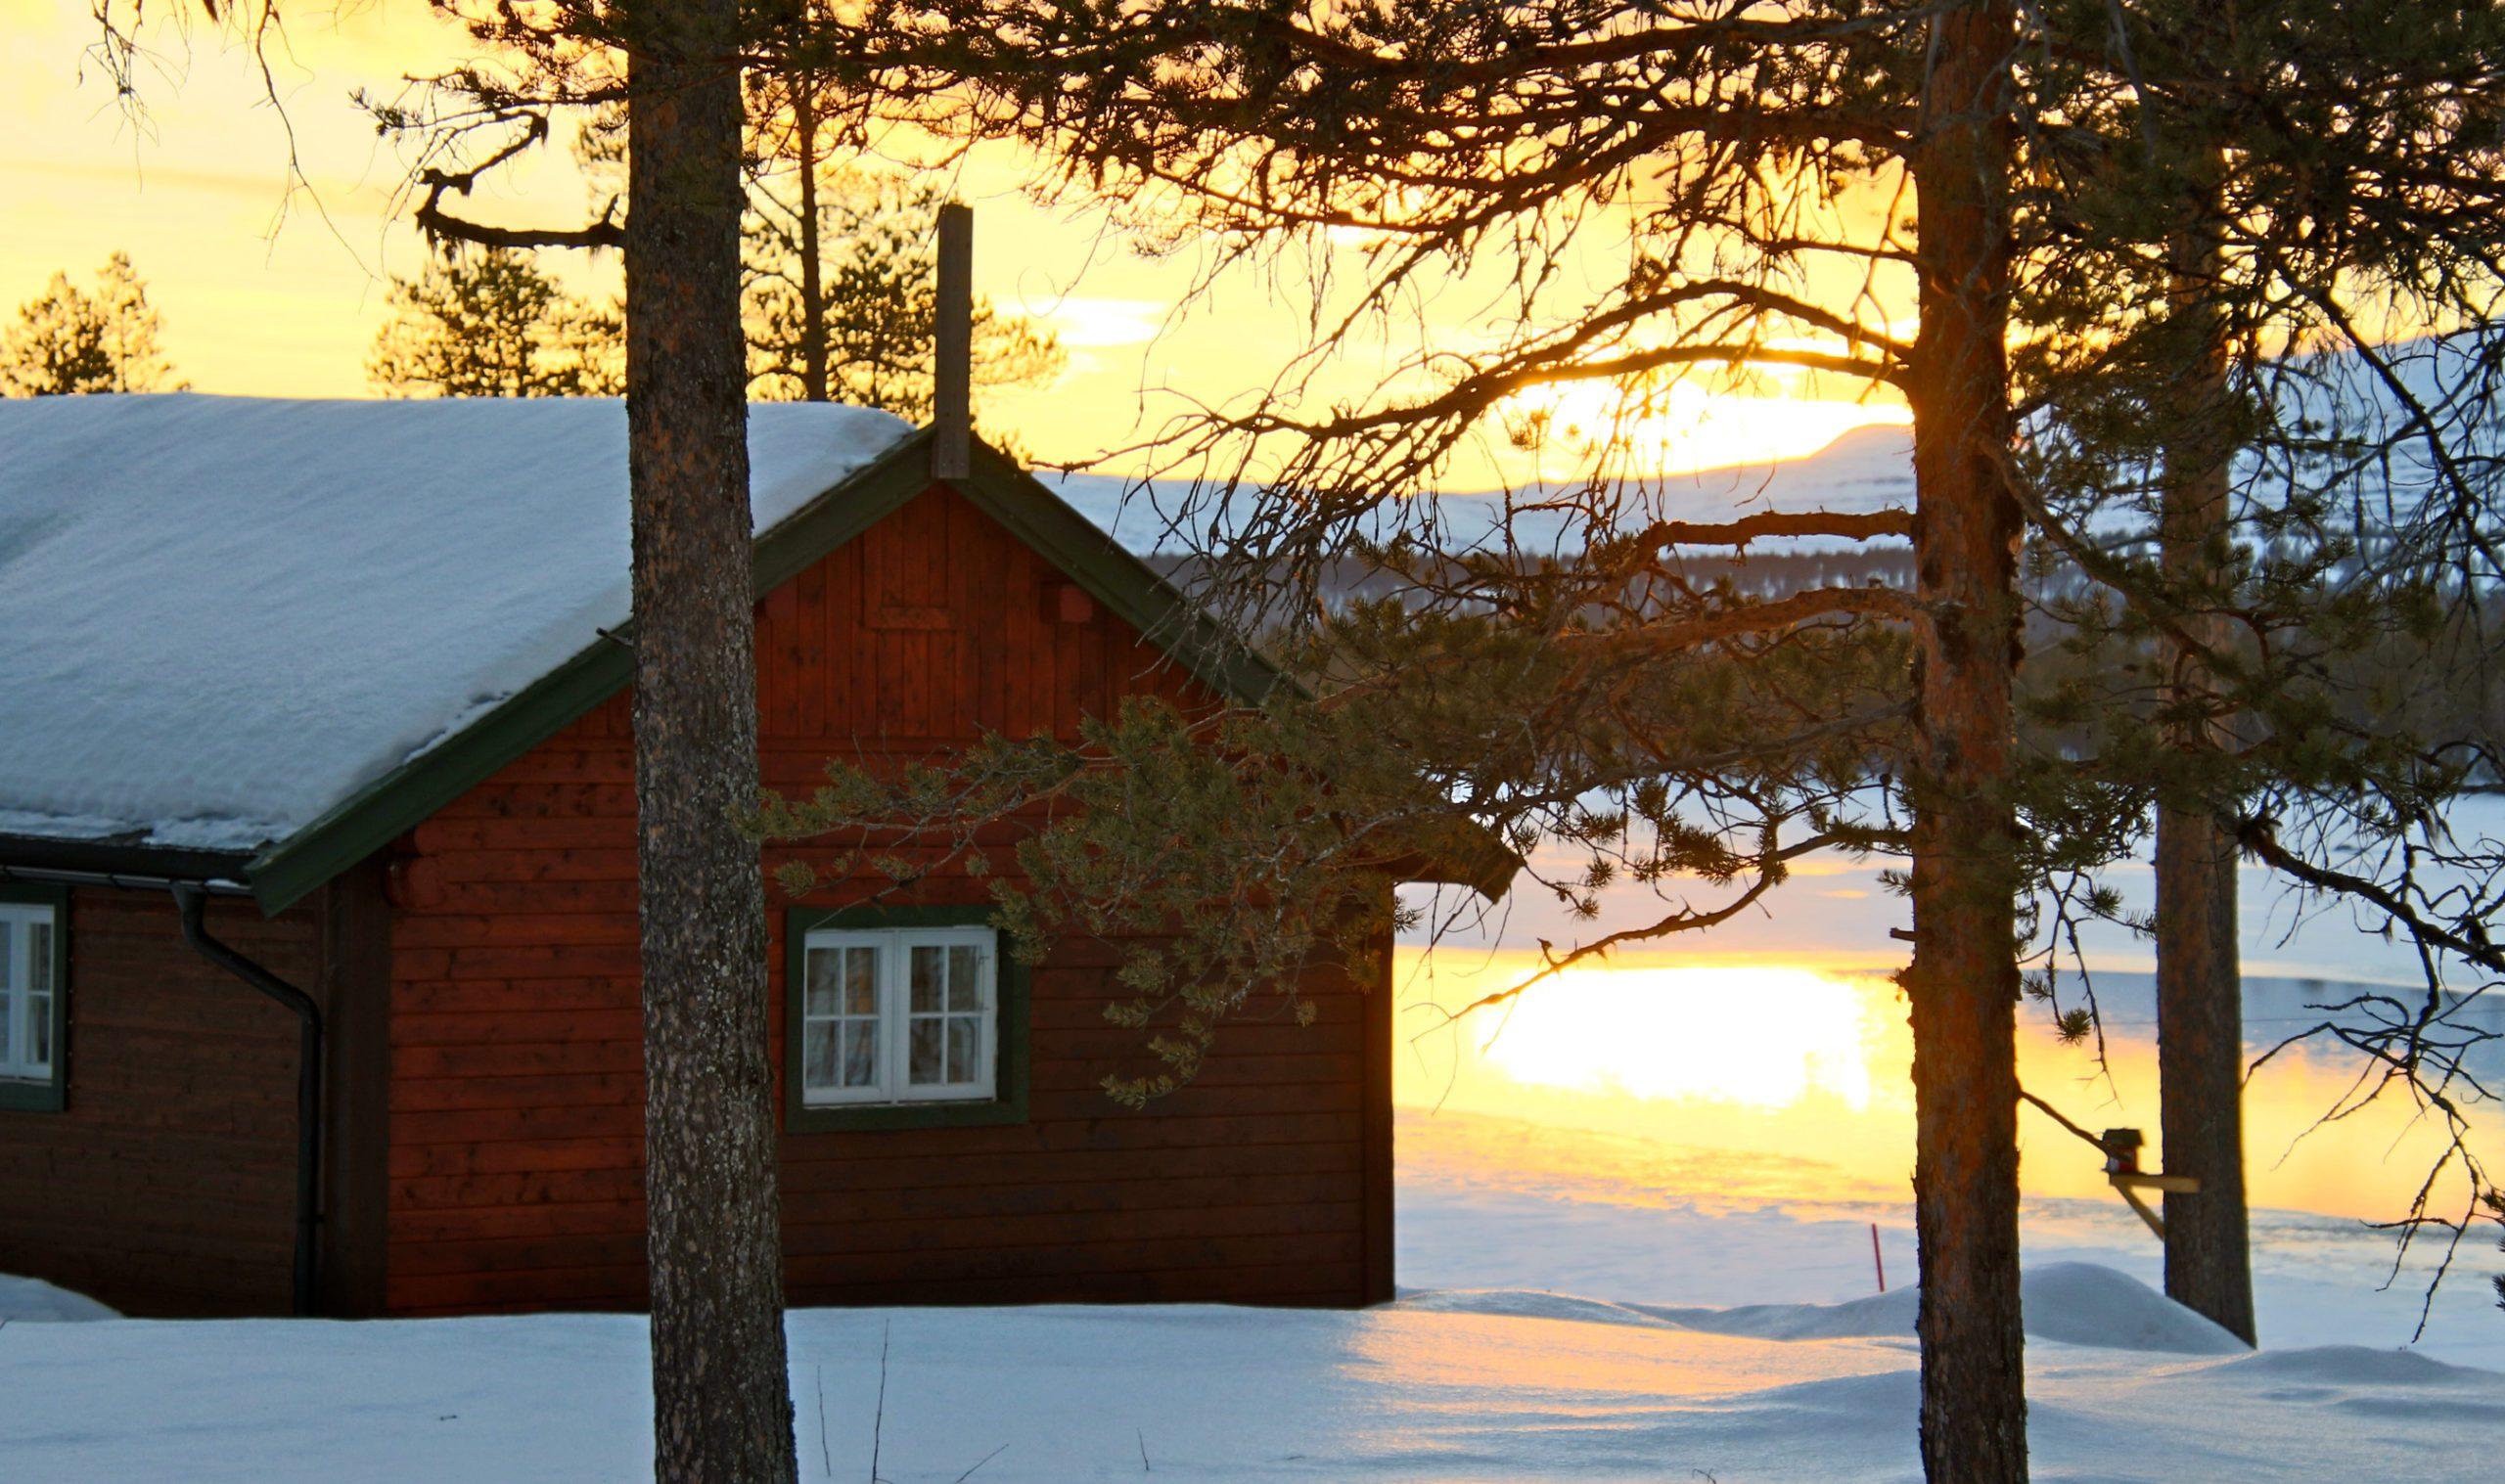 Schweden Haus-am-See Winteridylle